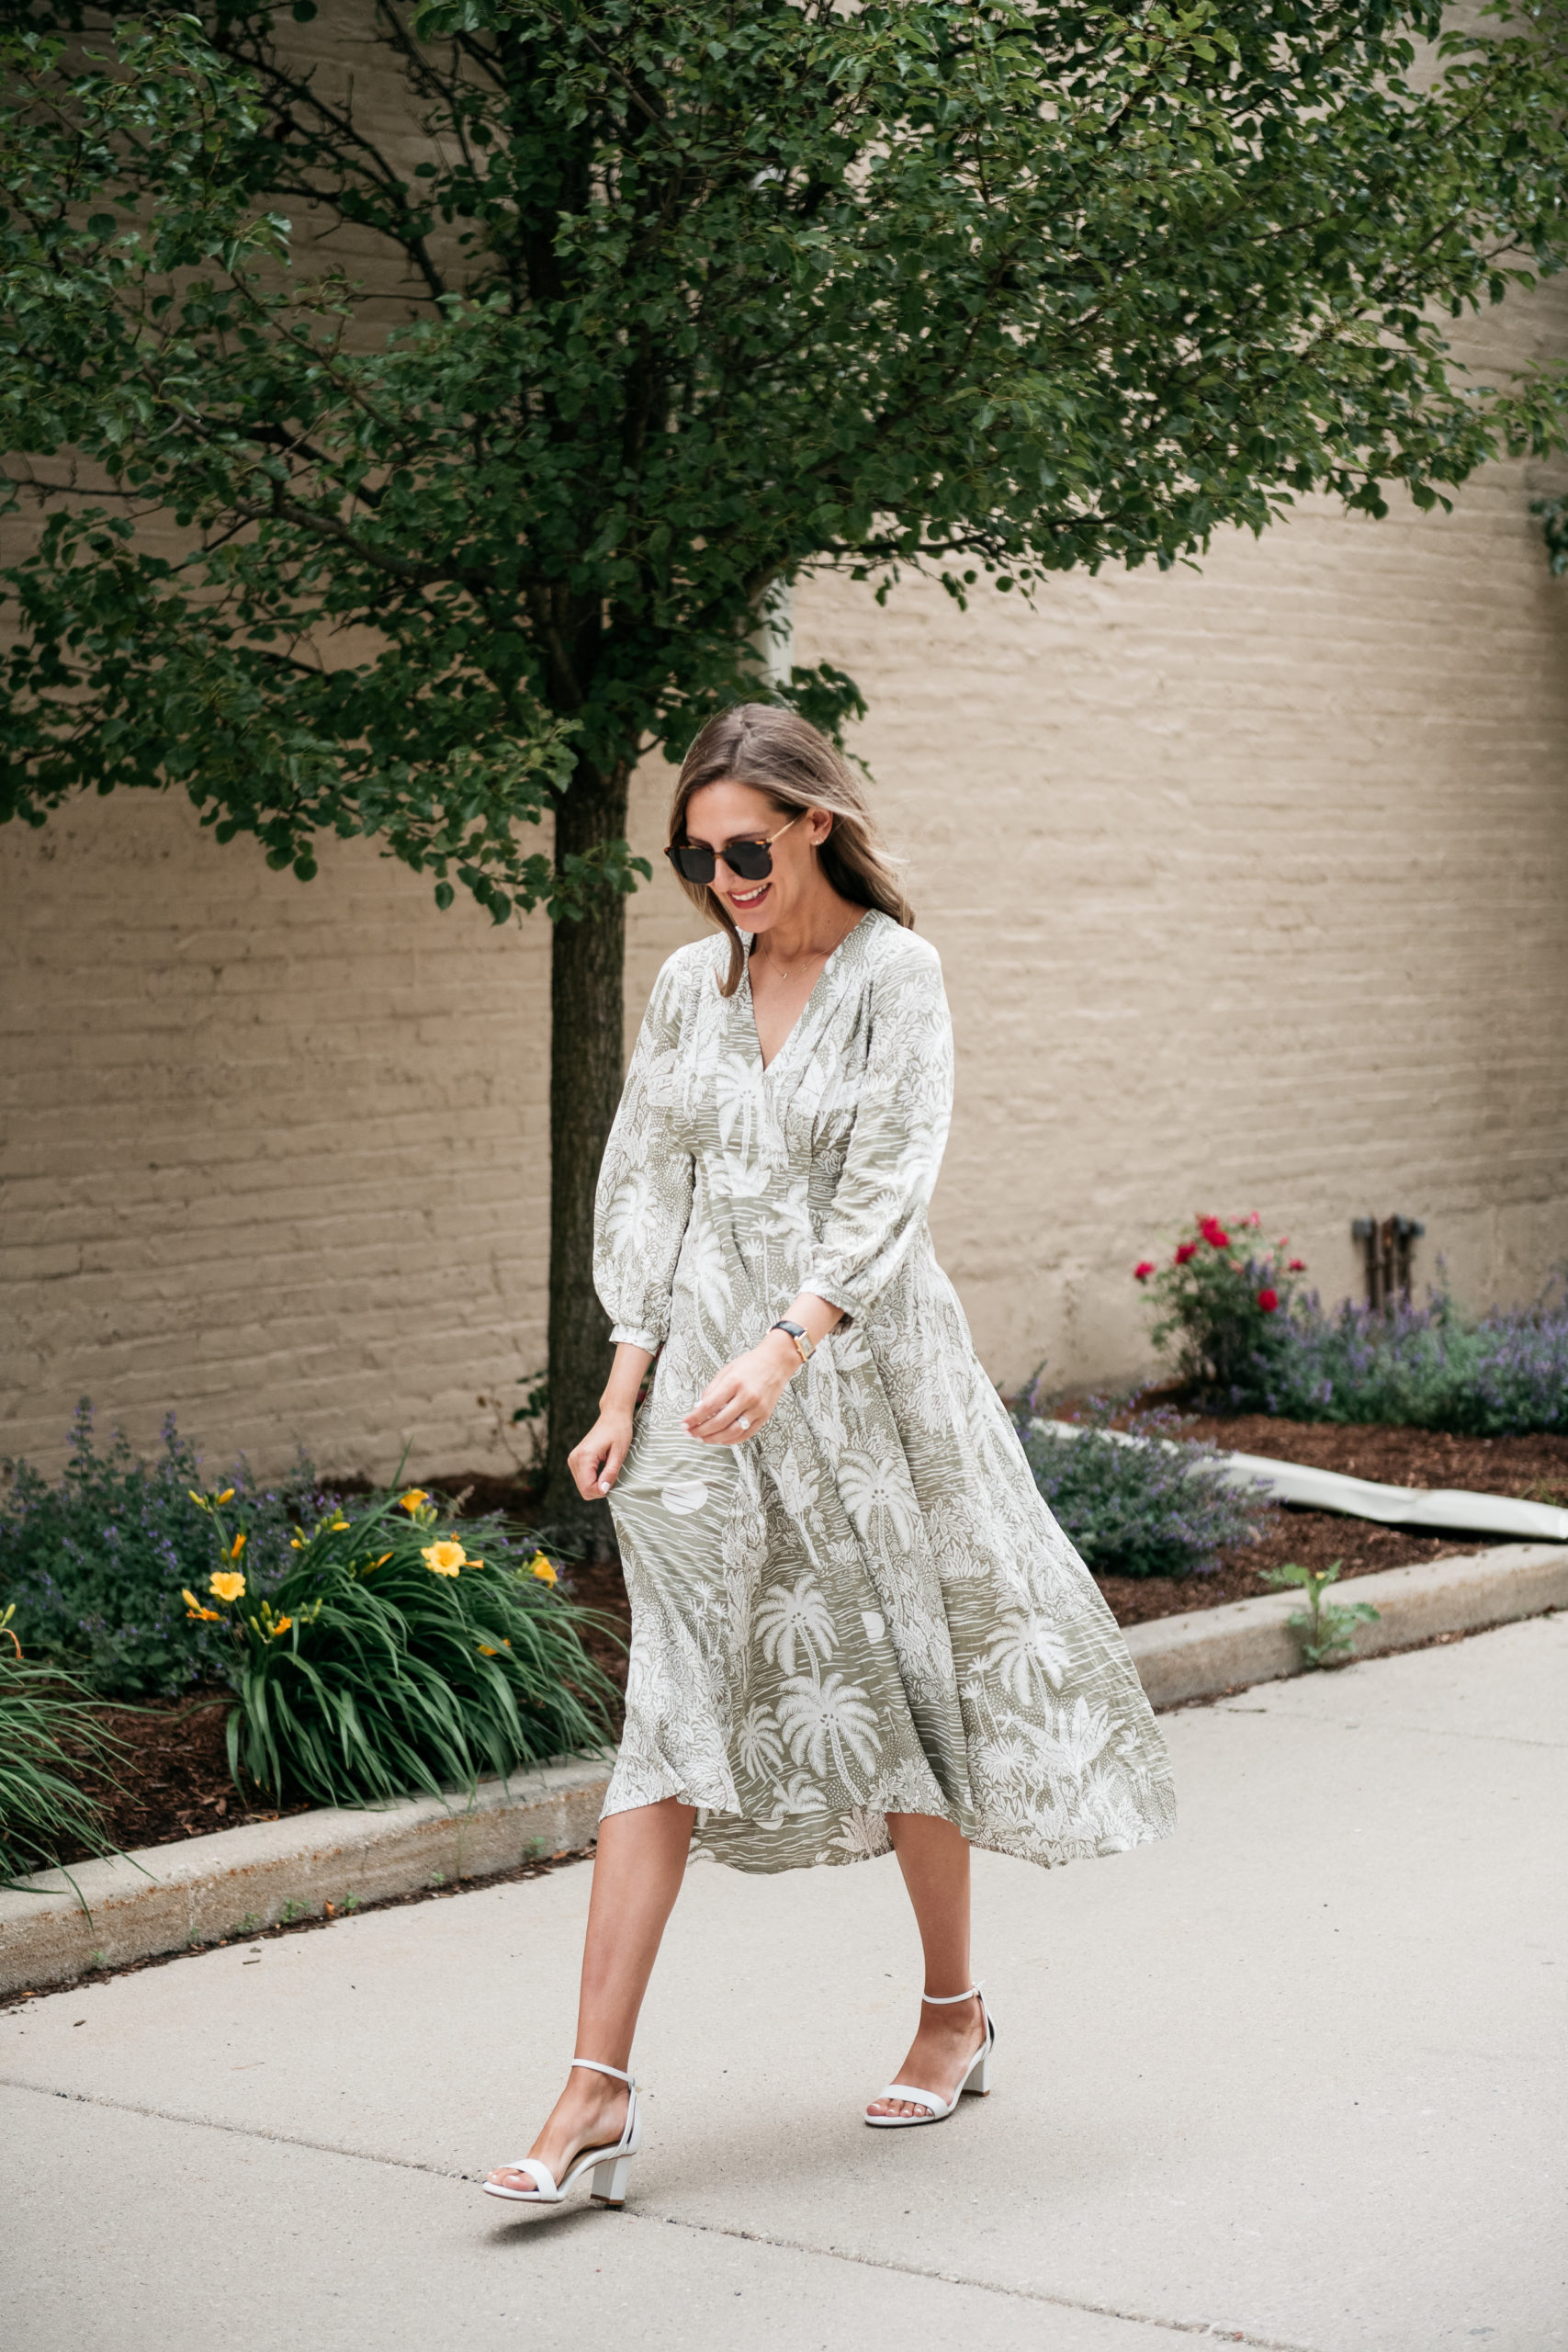 H&M inexpensive dress